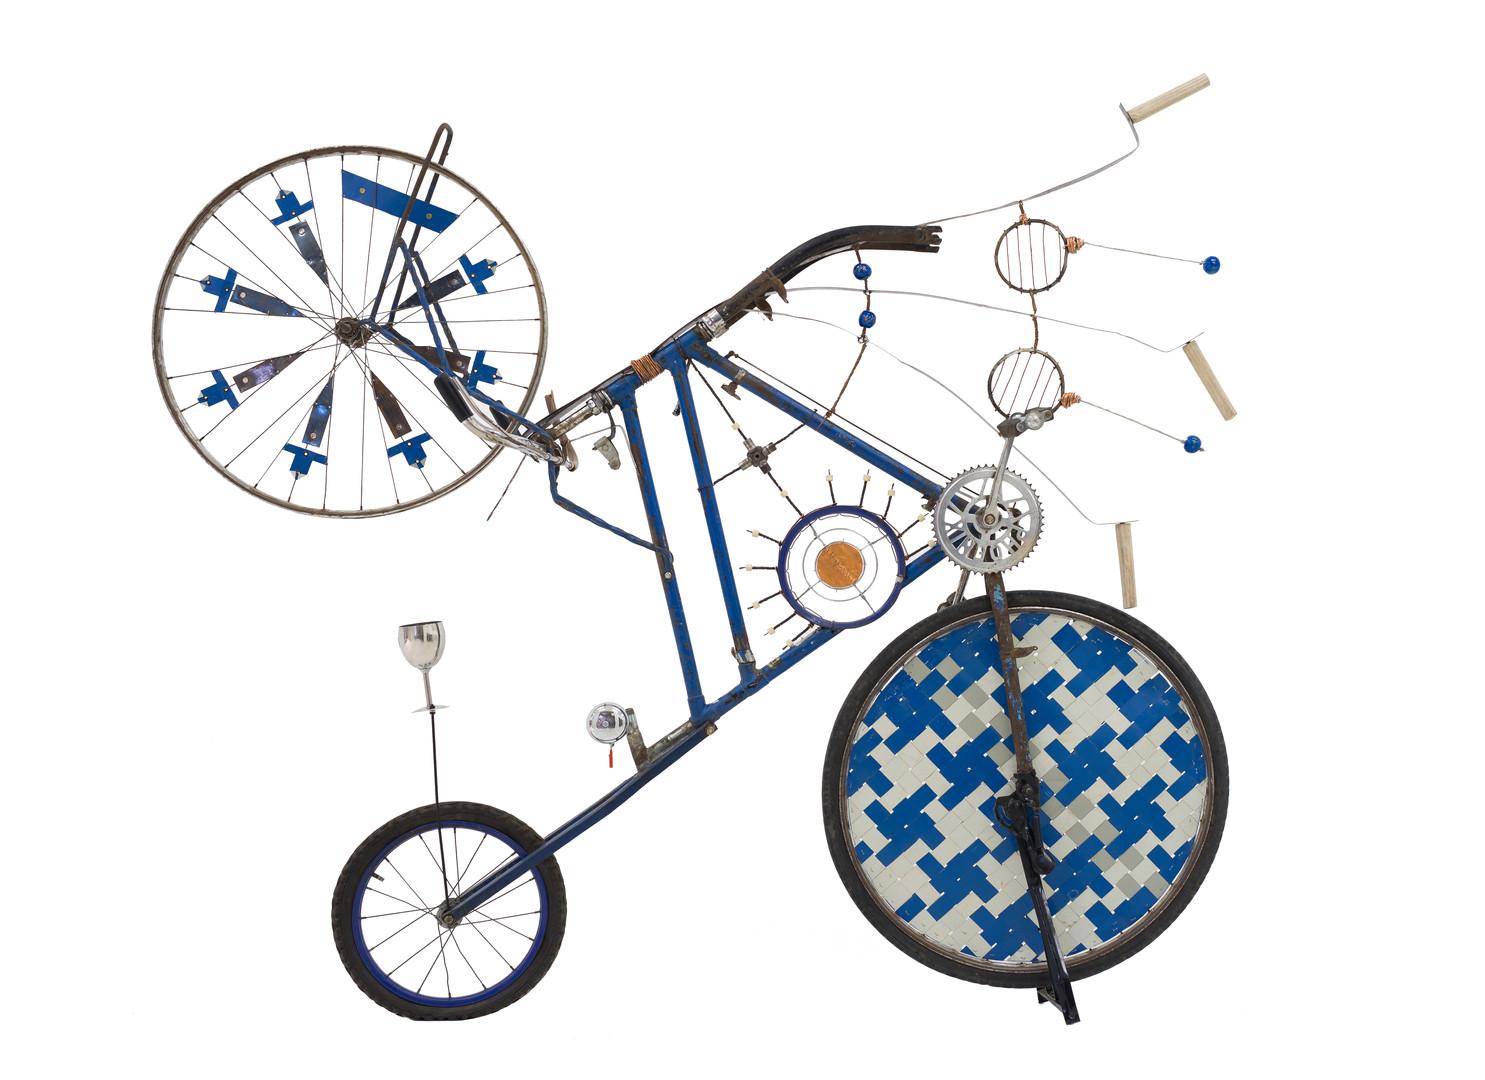 Cyrus Kabiru | The Blue Mamba | 2017 | Steel and Found Objects | 158 x 110 x 18 cm